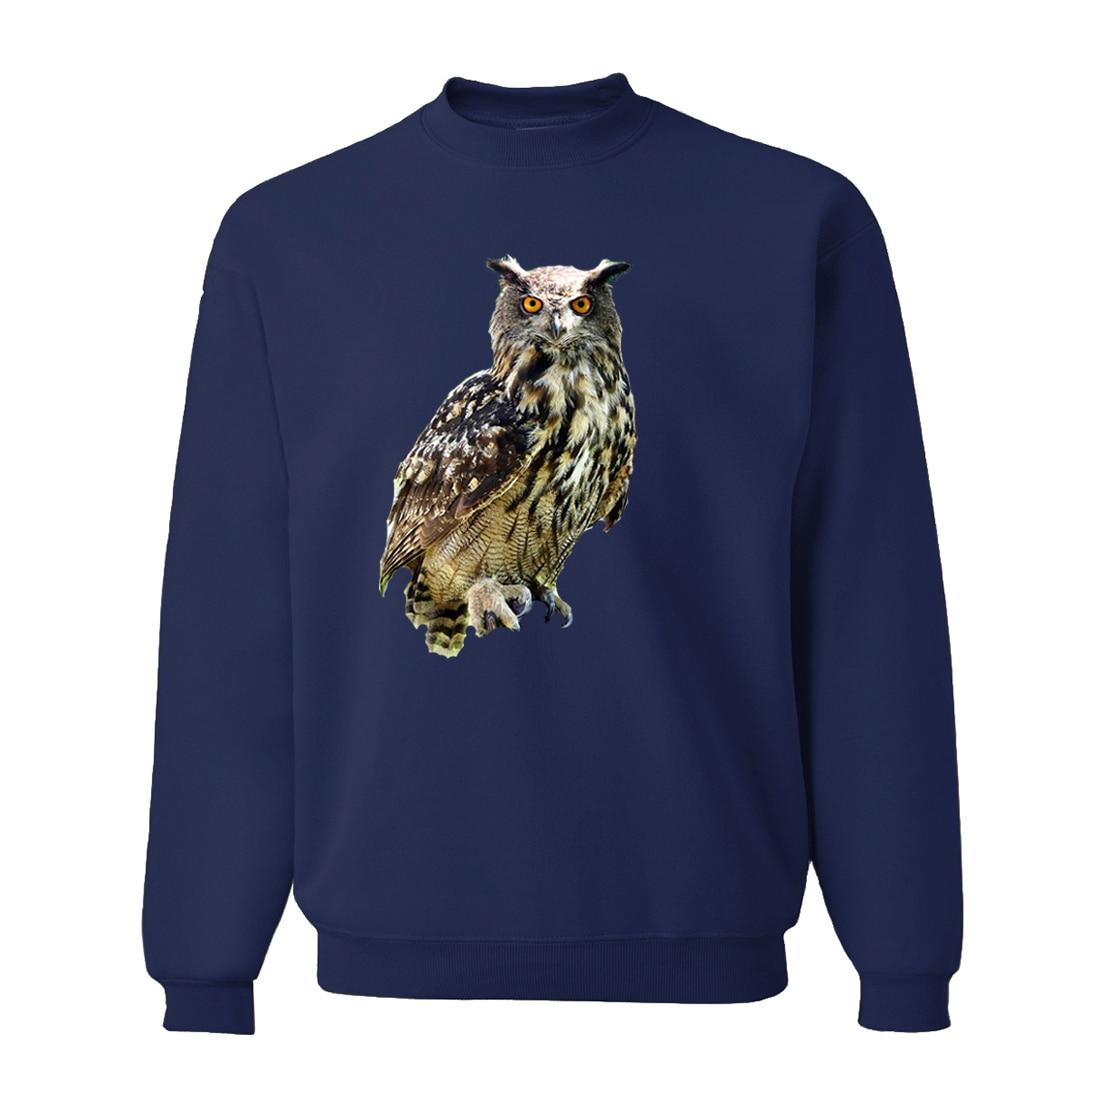 Animal Owl Funny Sweatshirt Hoodie Men 2019 New Autumn Animal Hooded Harajuku Casual Loose Fit Sweatshirts Brand Clothing CM01